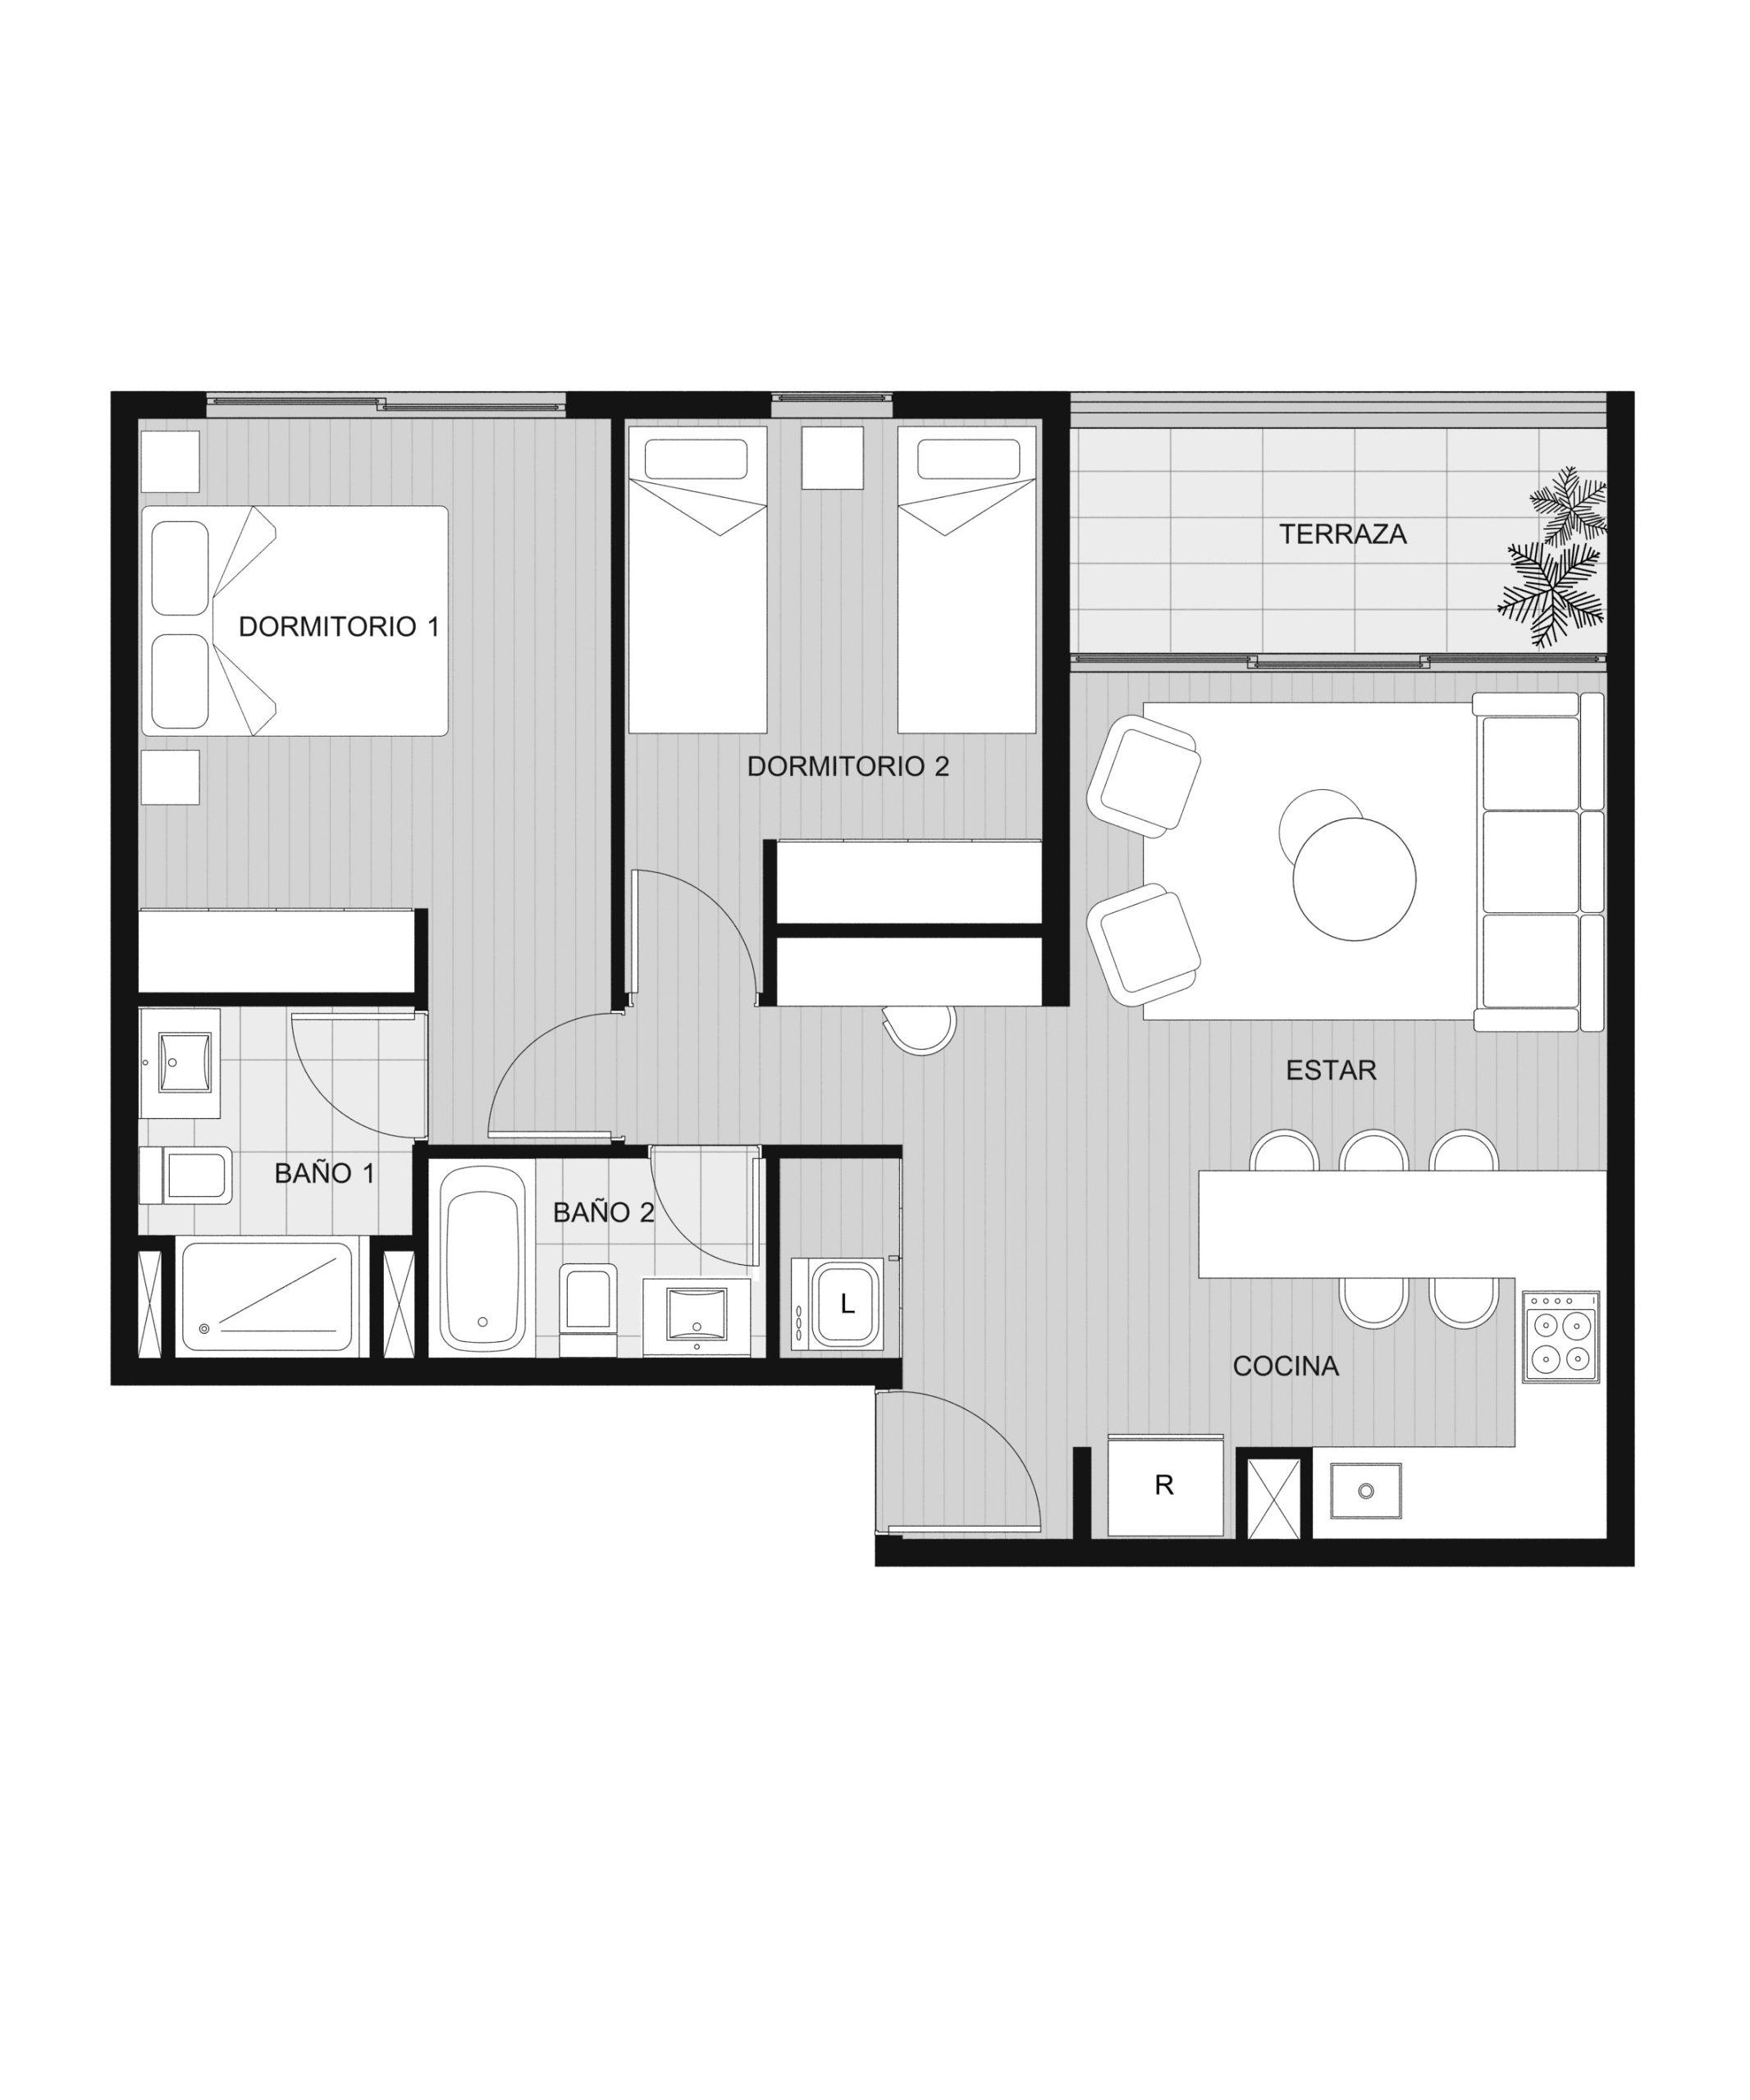 Condominio Playa Blanca - Depto B